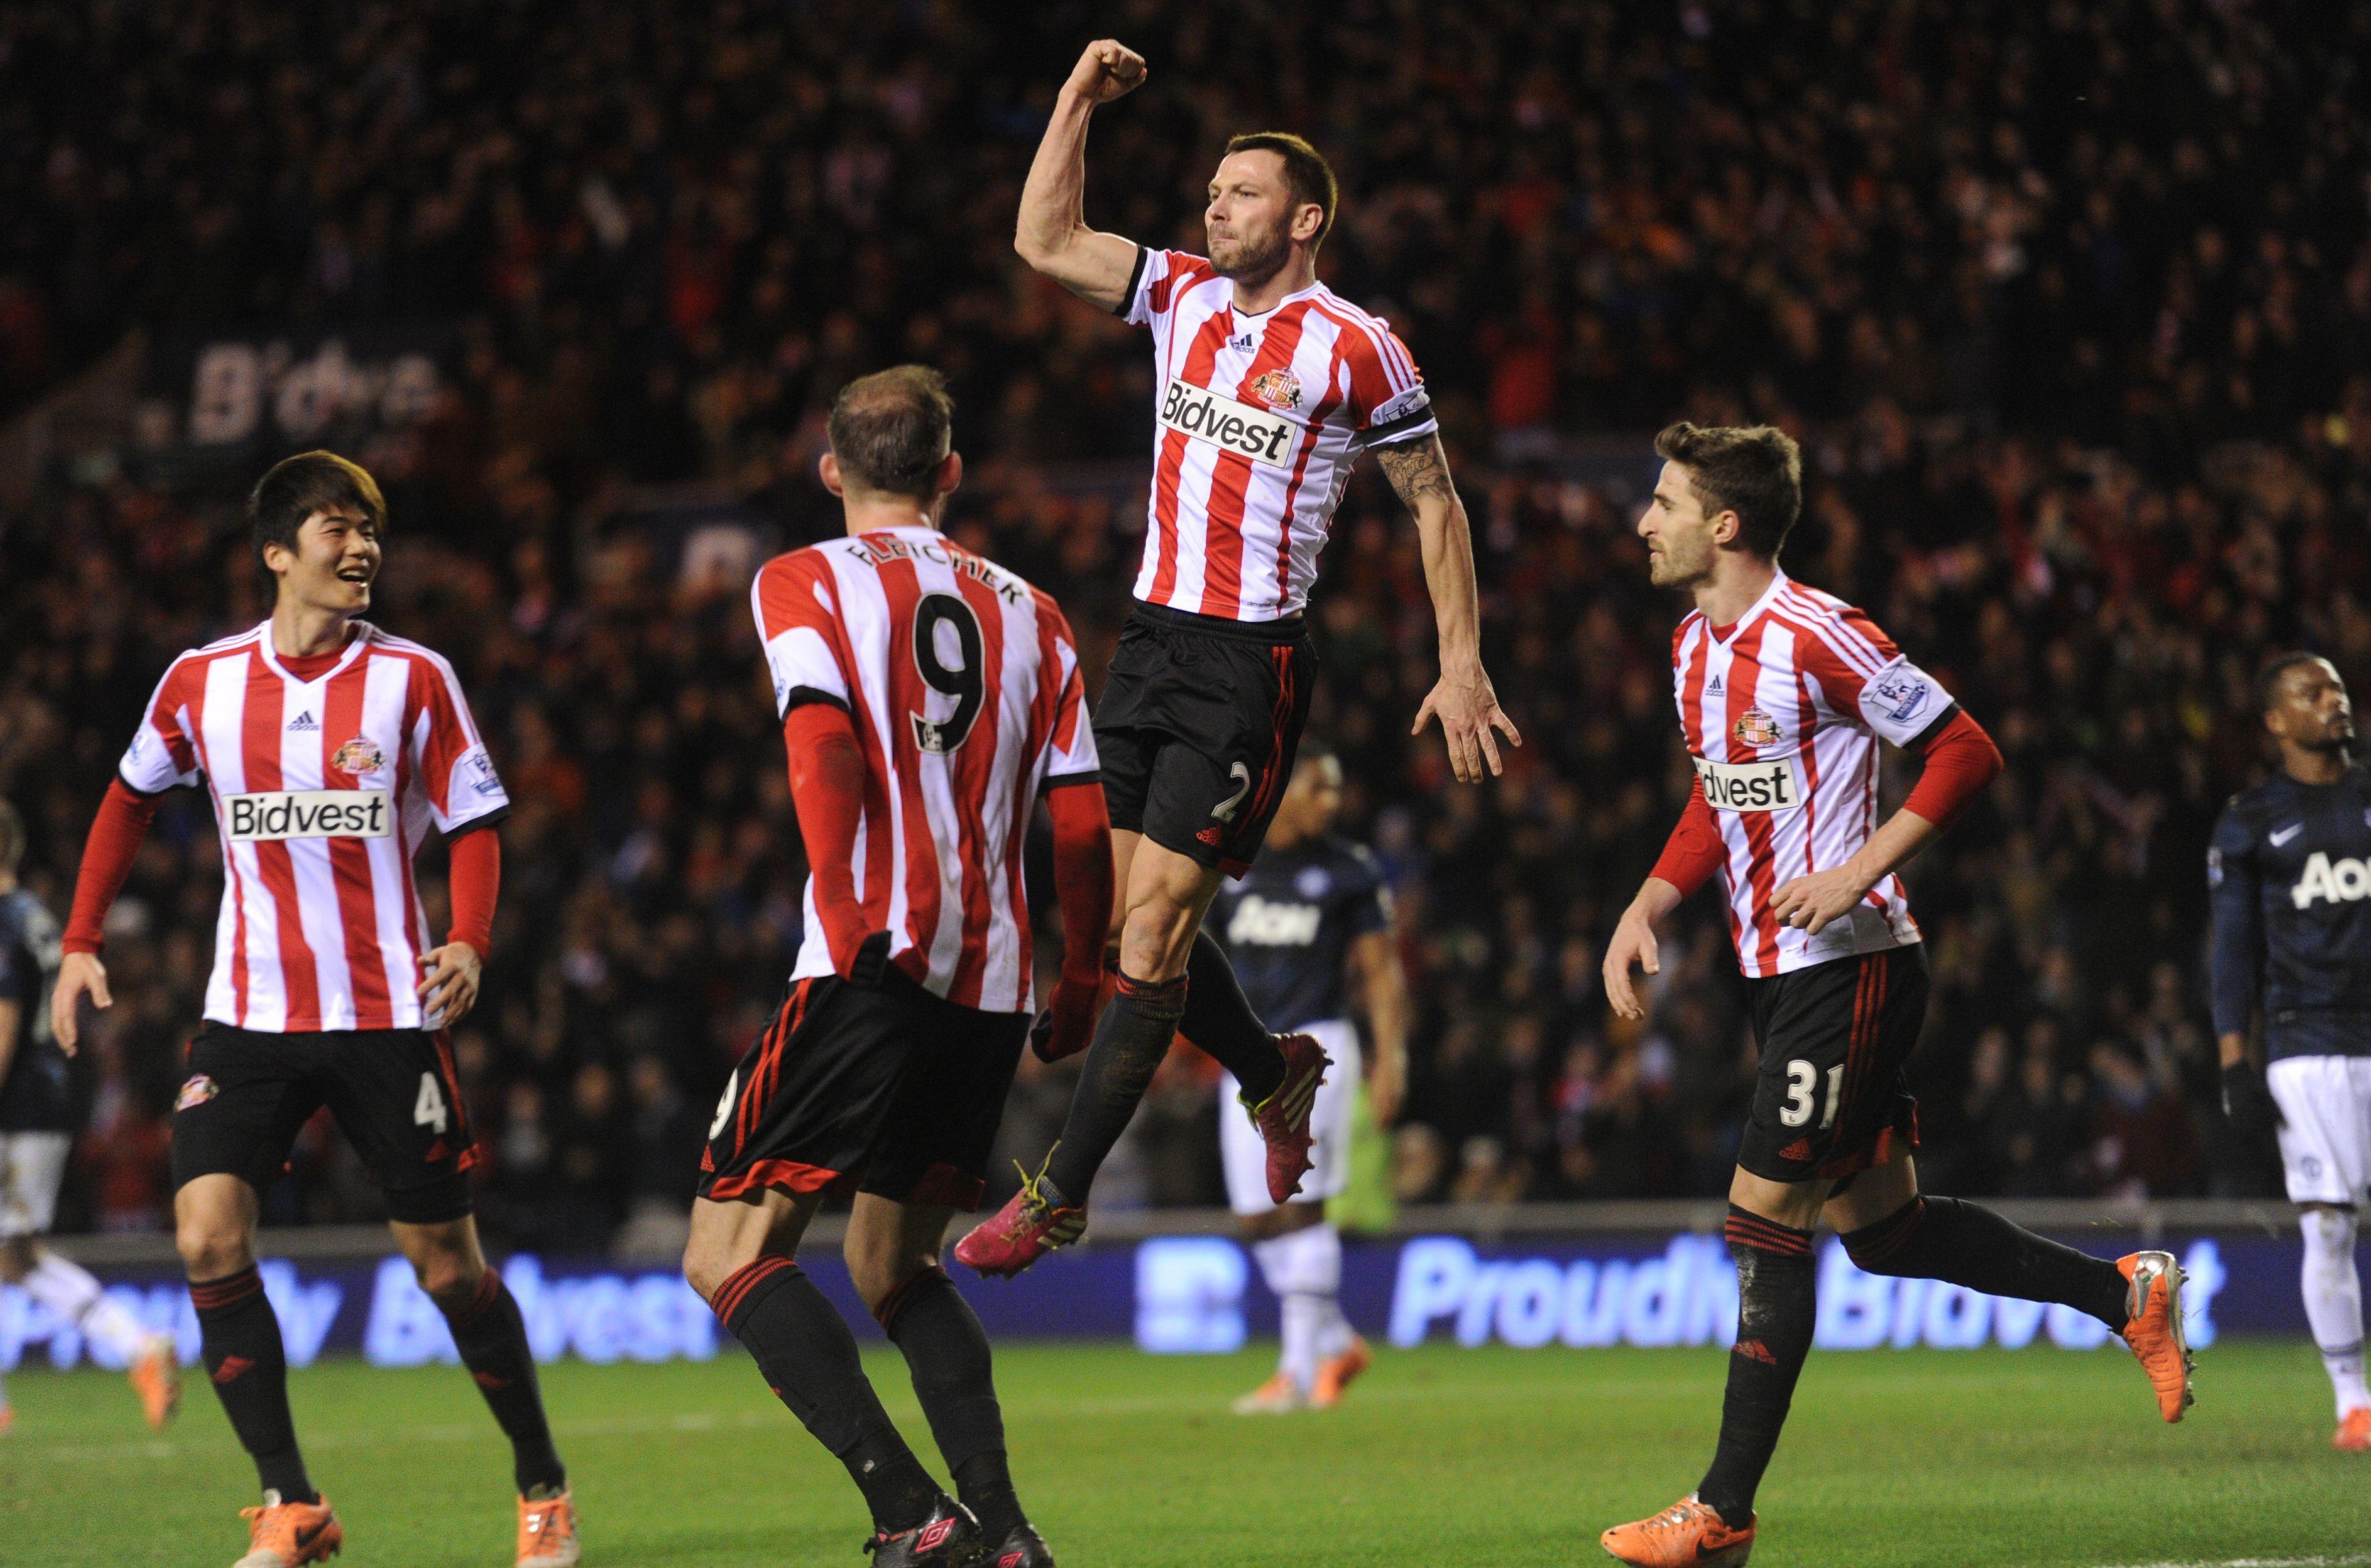 Soccer - Capital One Cup - Semi Final - First Leg - Sunderland v Manchester United - Stadium of Light